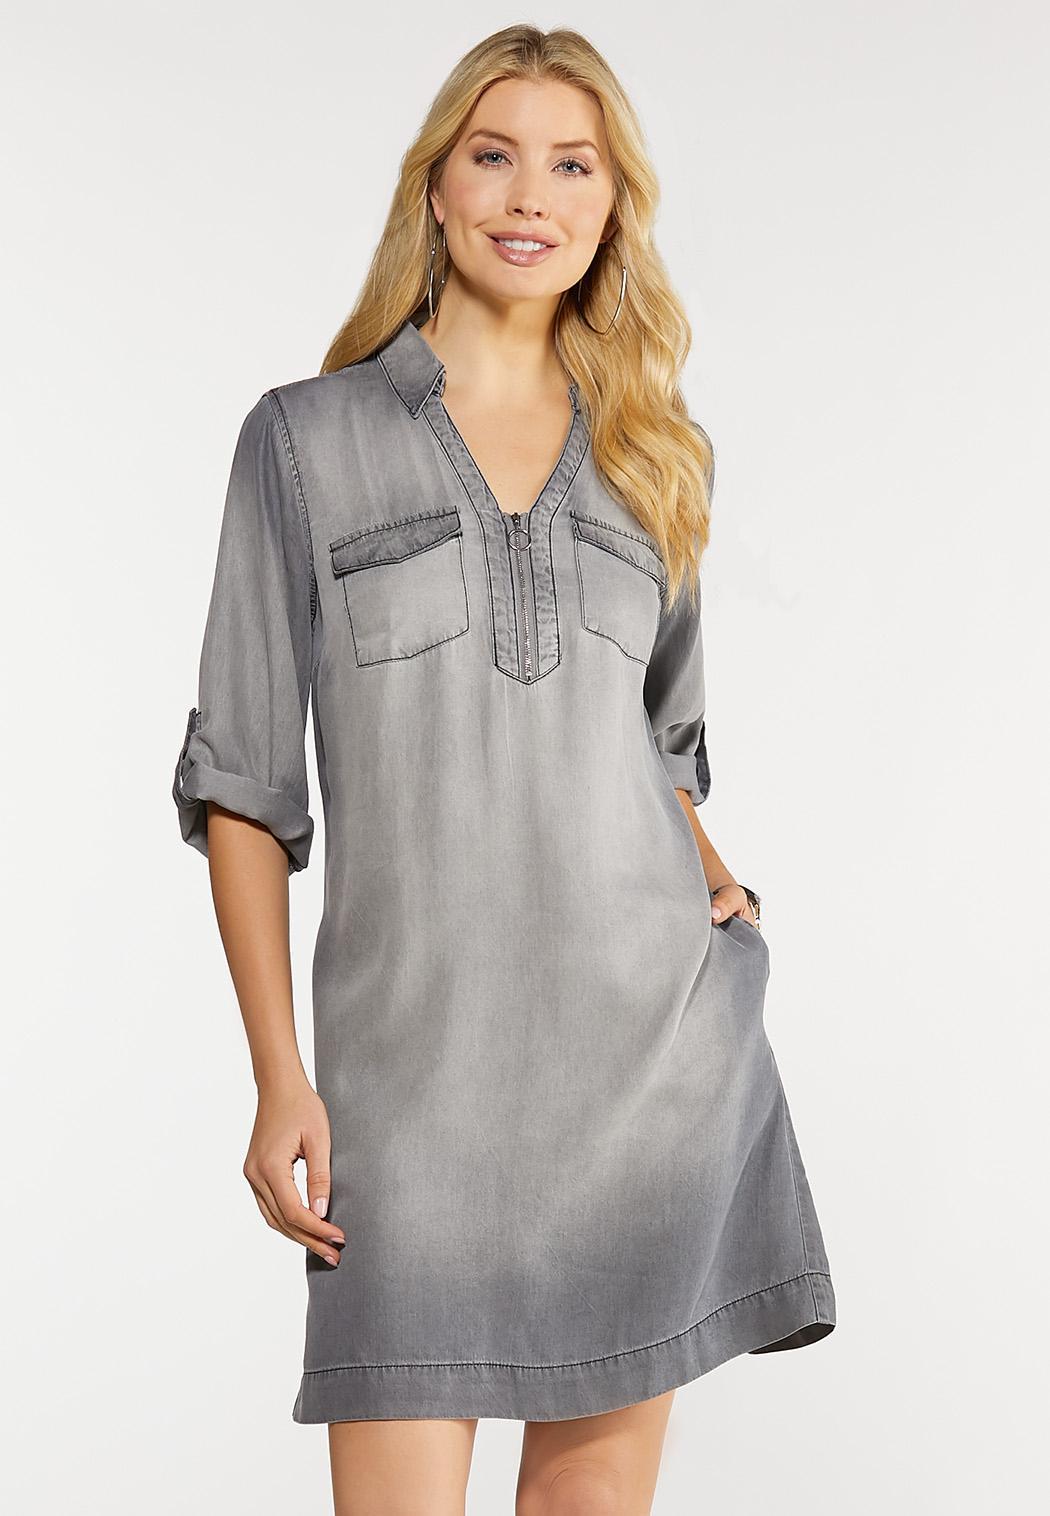 Plus Size Pocket Shirt Dress Plus Sizes Cato Fashions